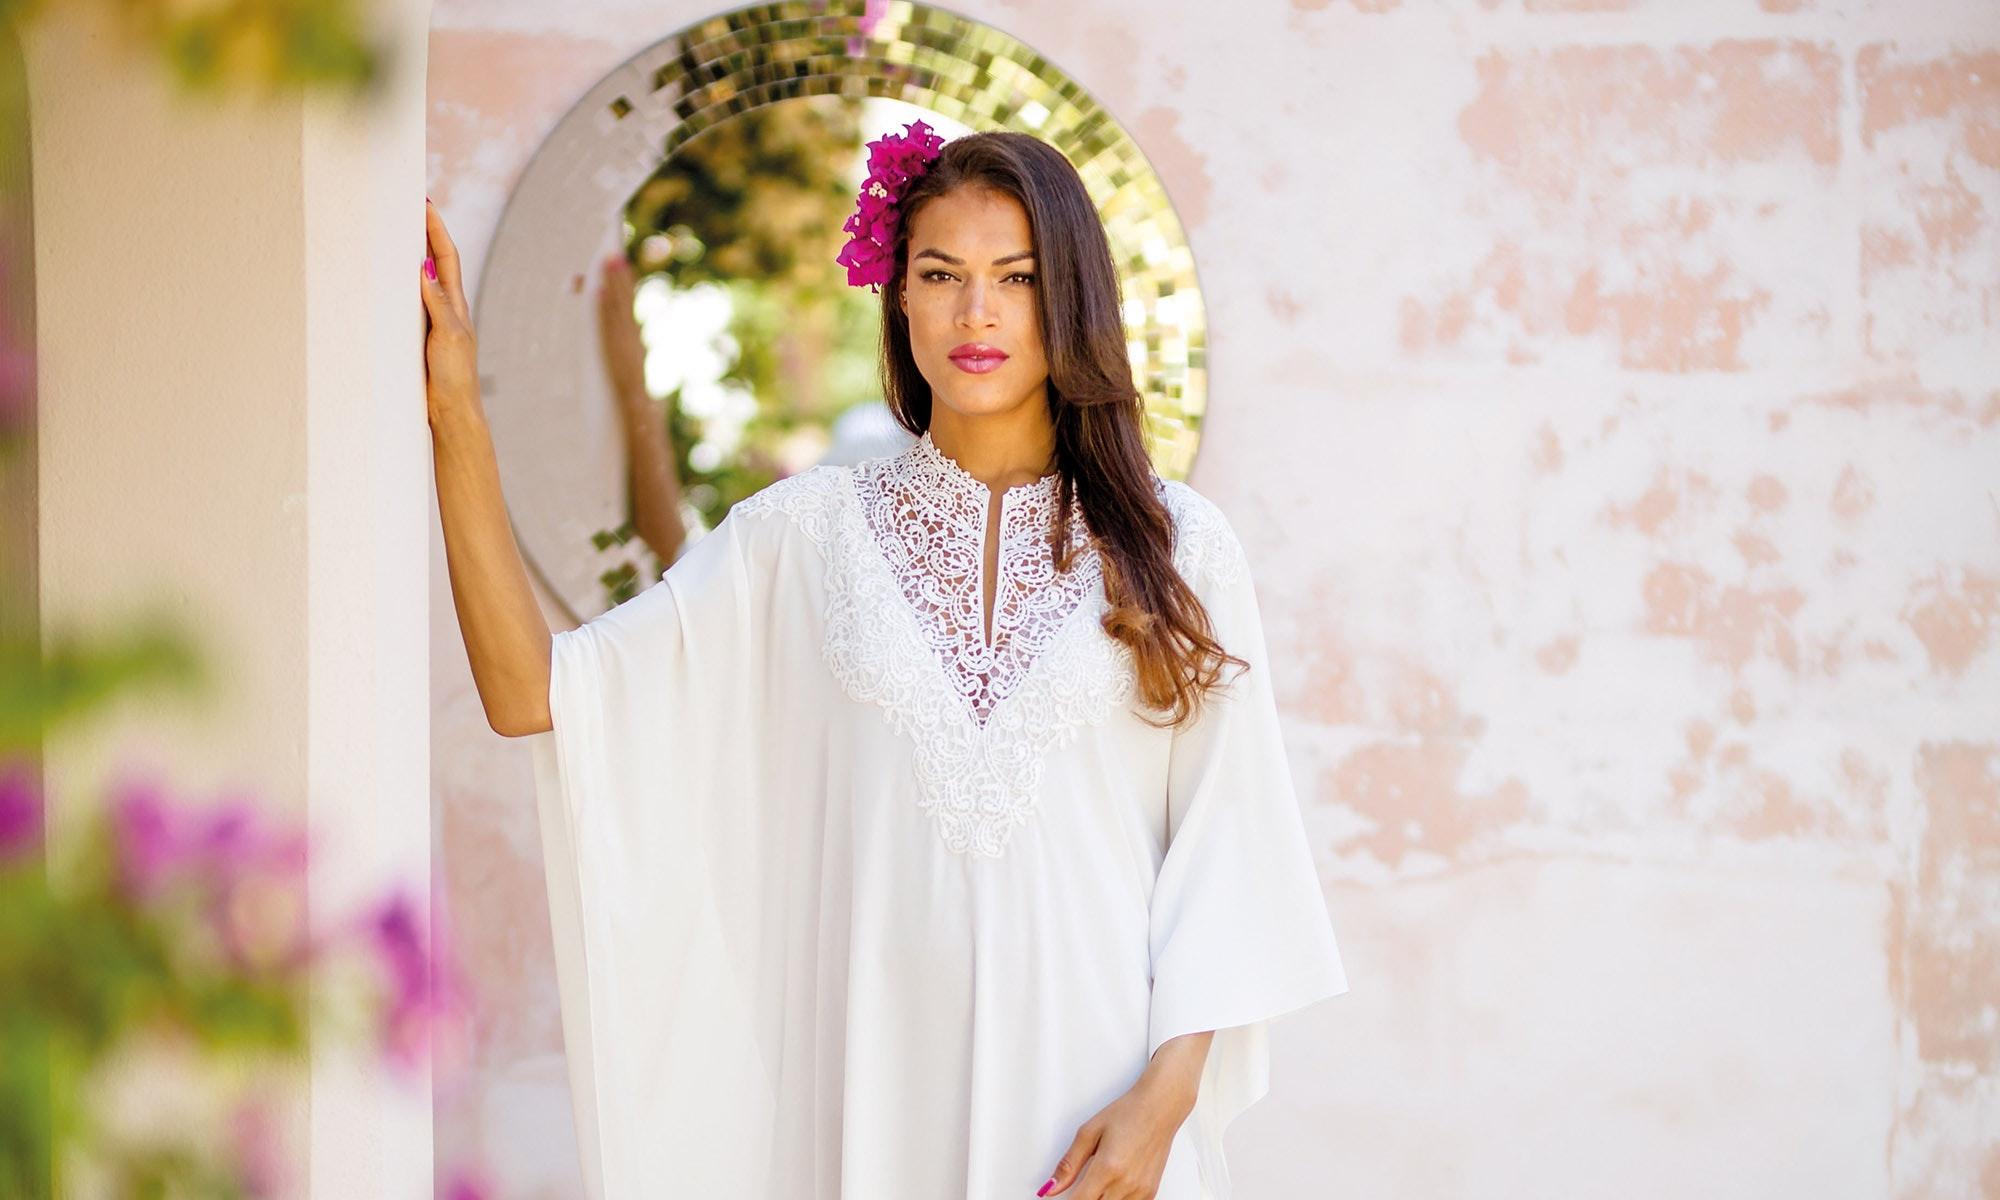 Woman Wearing White Dress, Attractive, Looking, Woman, Wear, HQ Photo